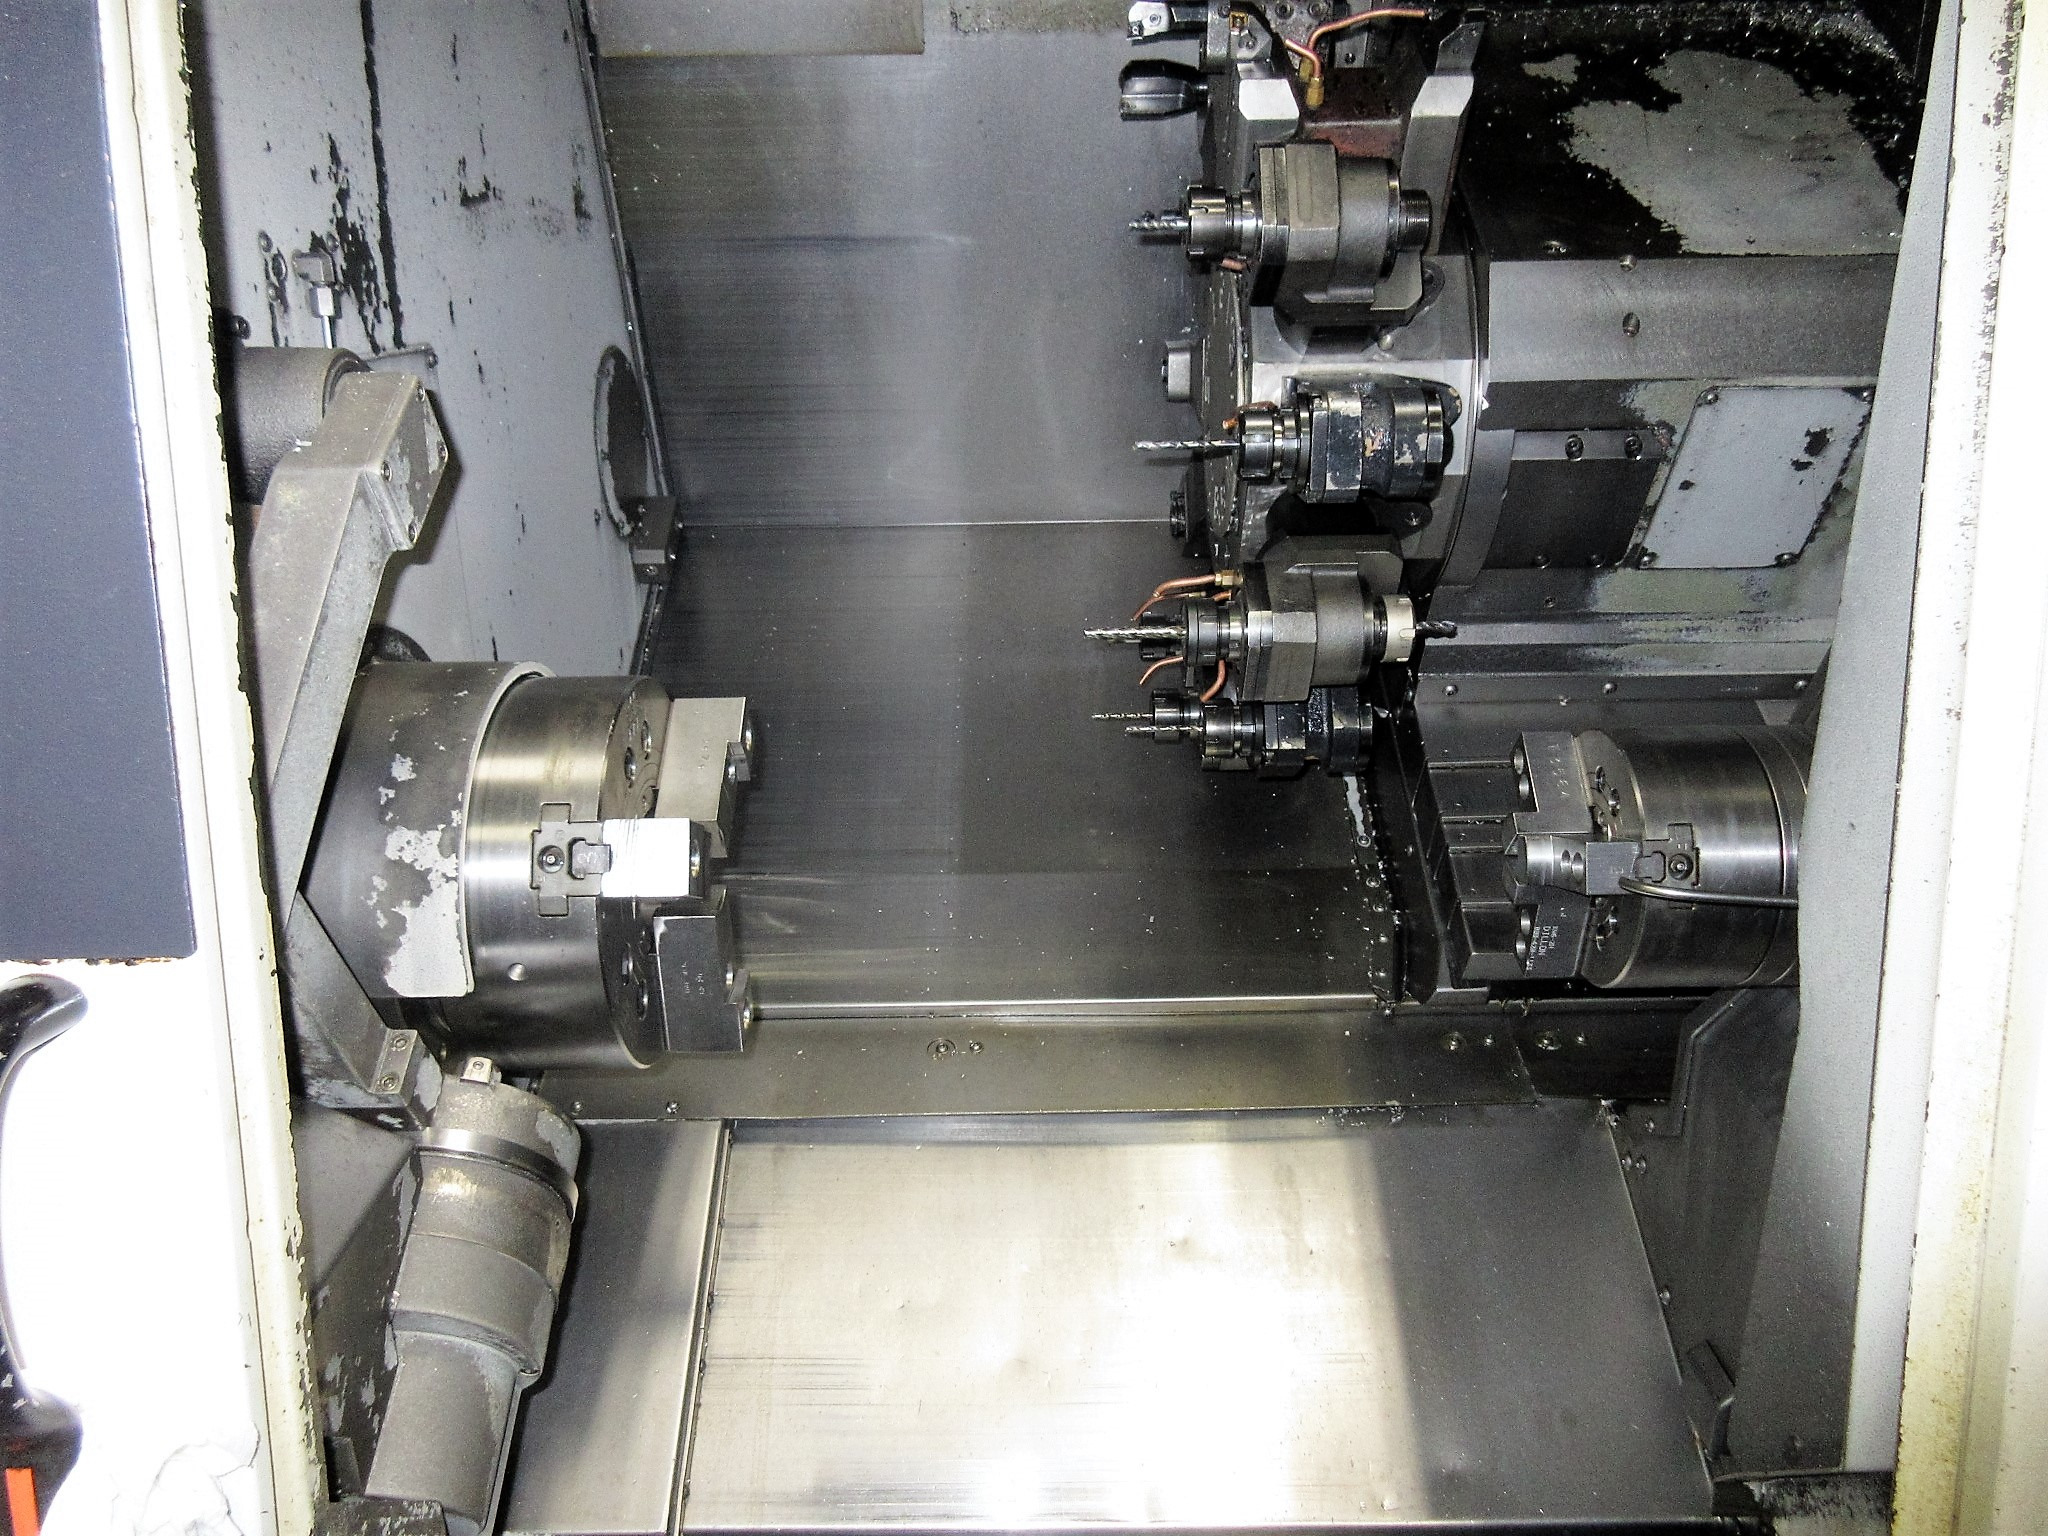 MAZAK QUICK TURN NEXUS 250-II MSY CNC TURNING CENTER - Image 7 of 16